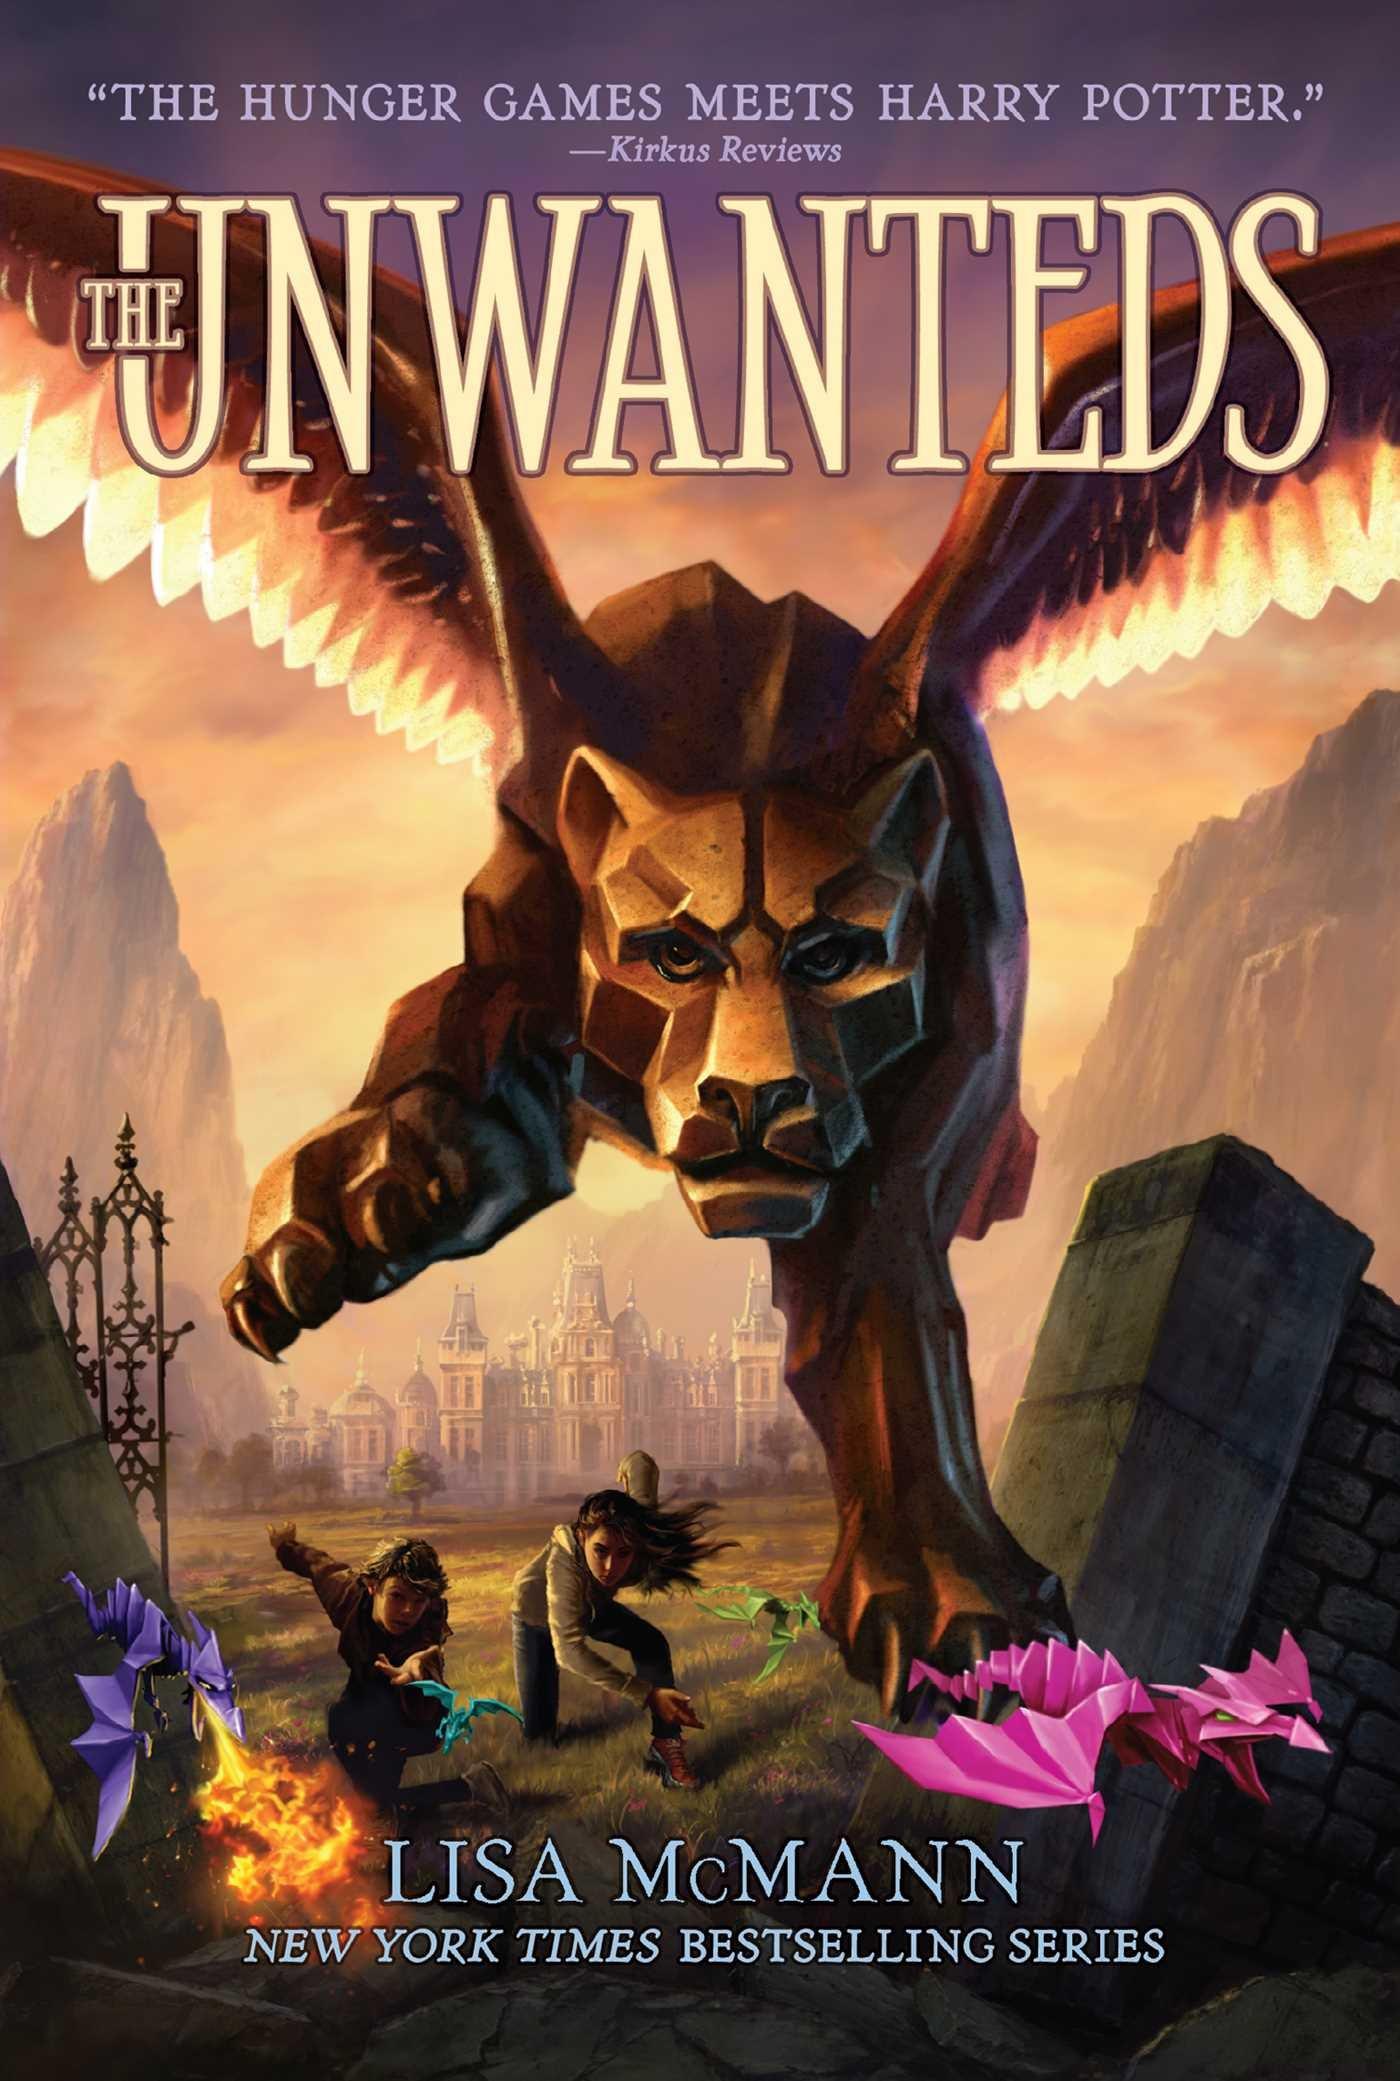 Amazon.com: The Unwanteds (1): 9781442407695: McMann, Lisa: Books